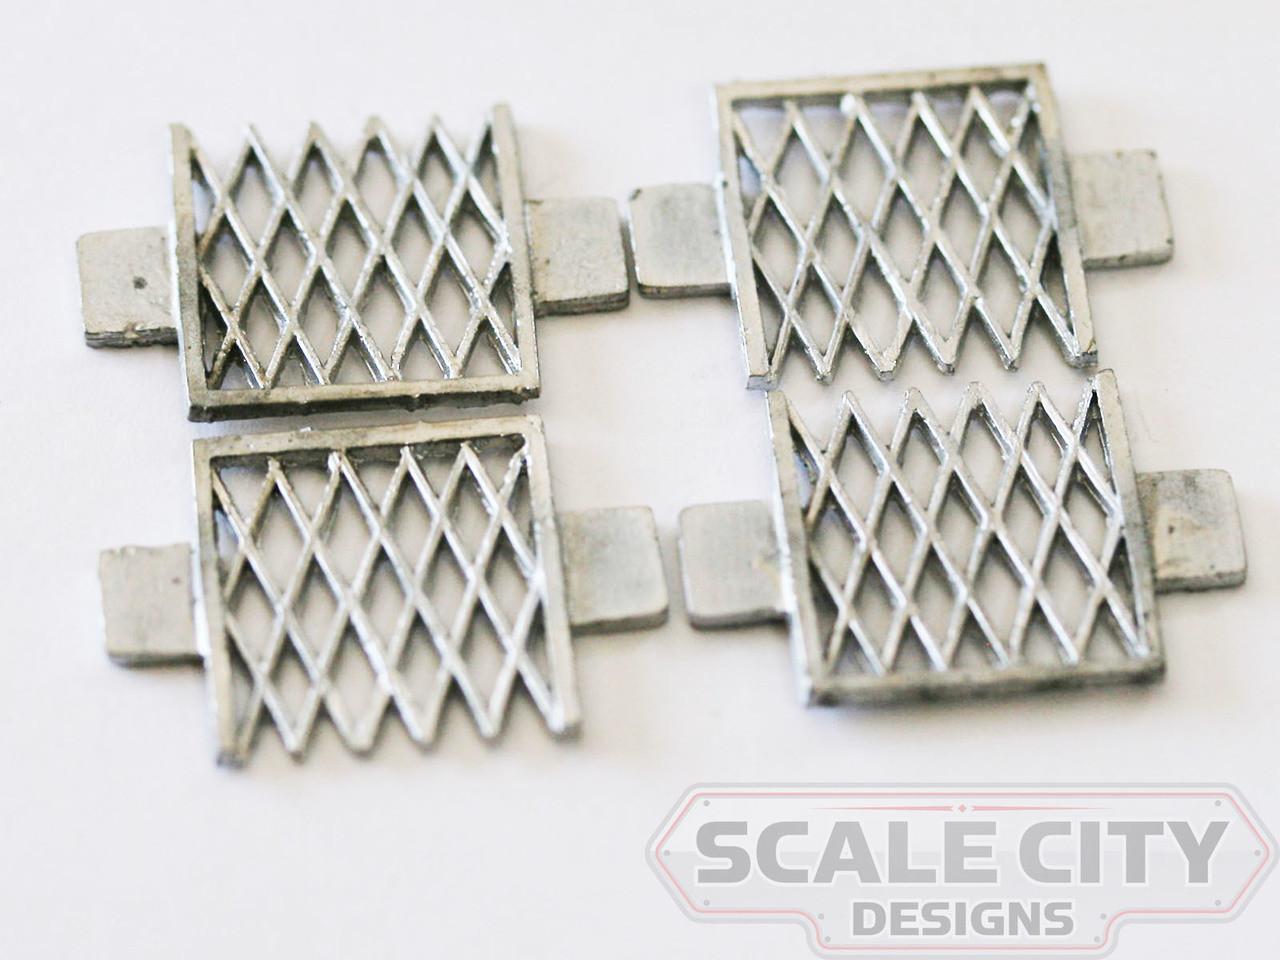 48-226 Vertibule gate diamond bars Passenger Car O Scale